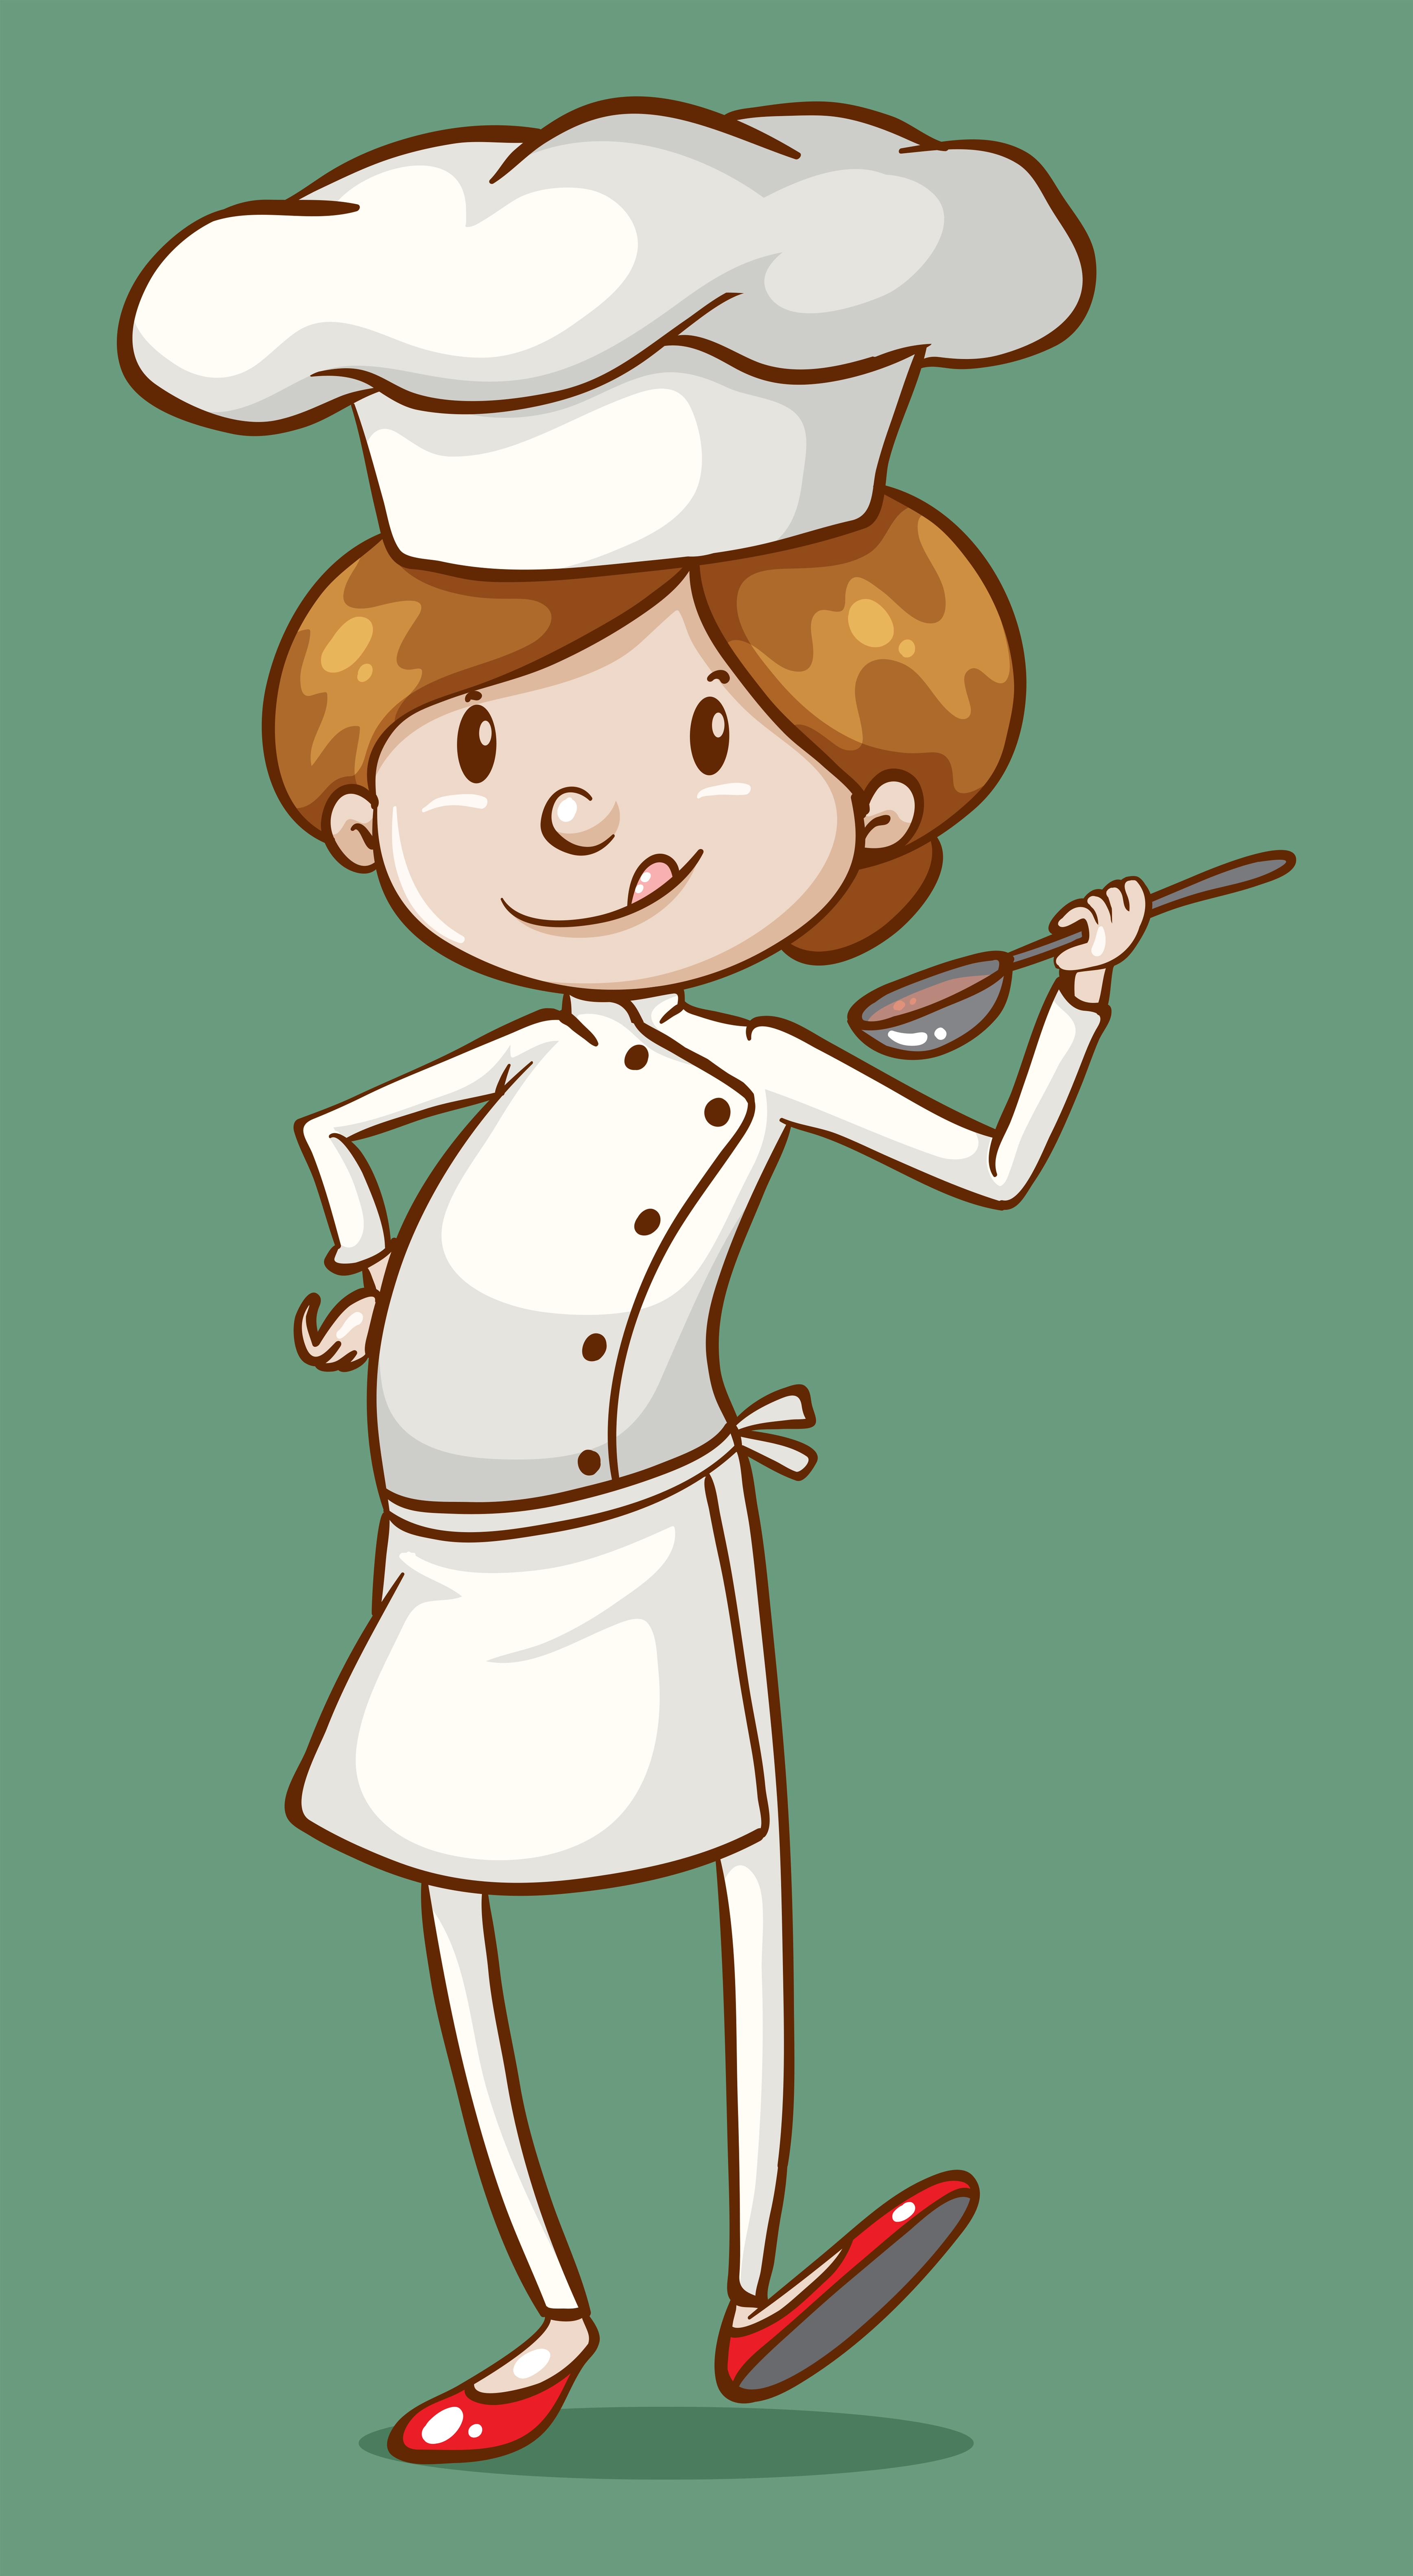 Female Chef Tasting Food In Spoon Download Free Vectors